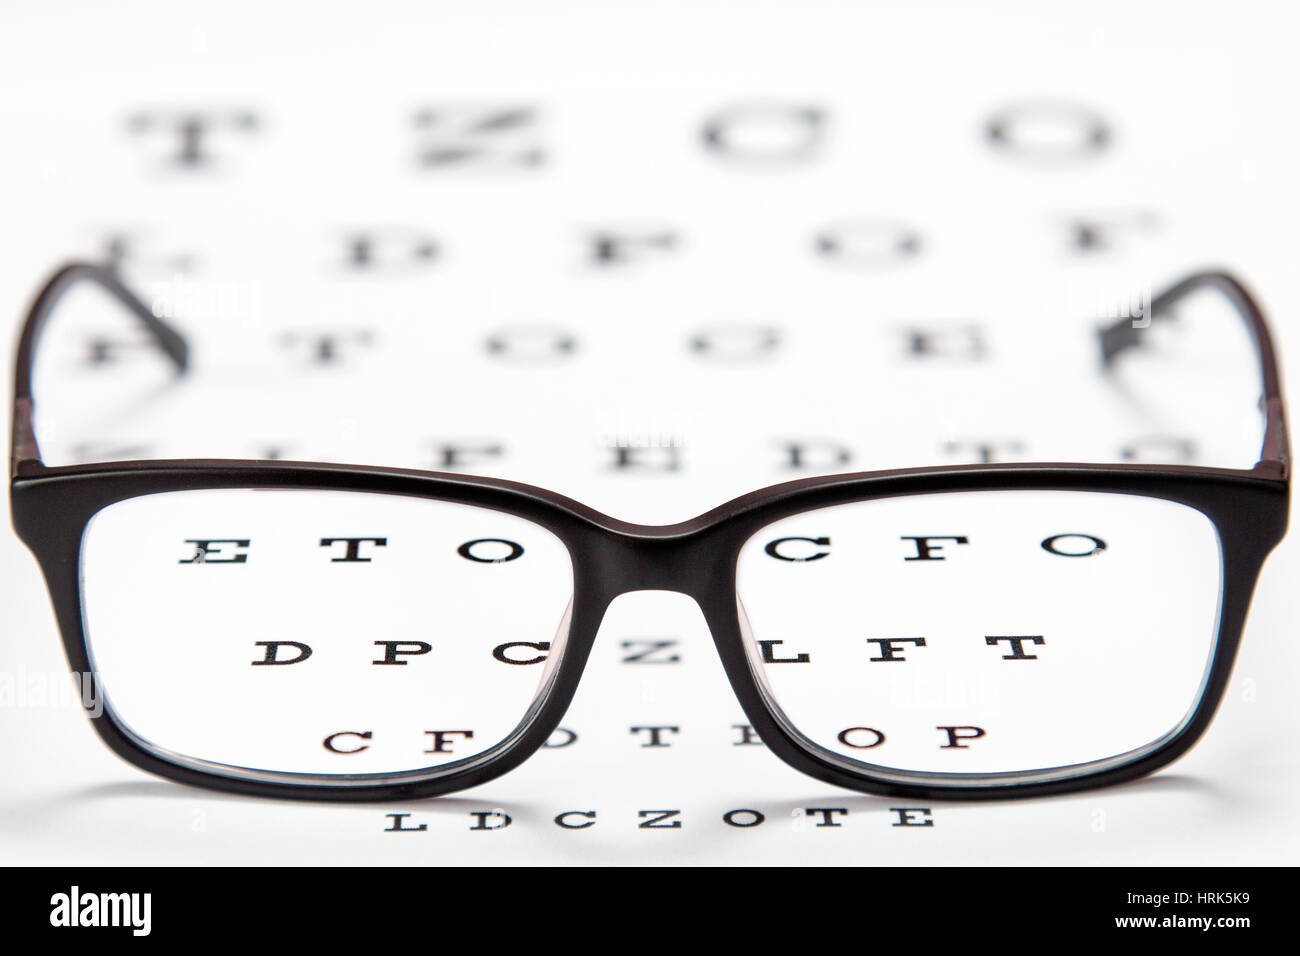 d945aaaa11 Glasses on a eye exam chart to test eyesight accuracy stock photo jpg  1300x956 Exam glasses